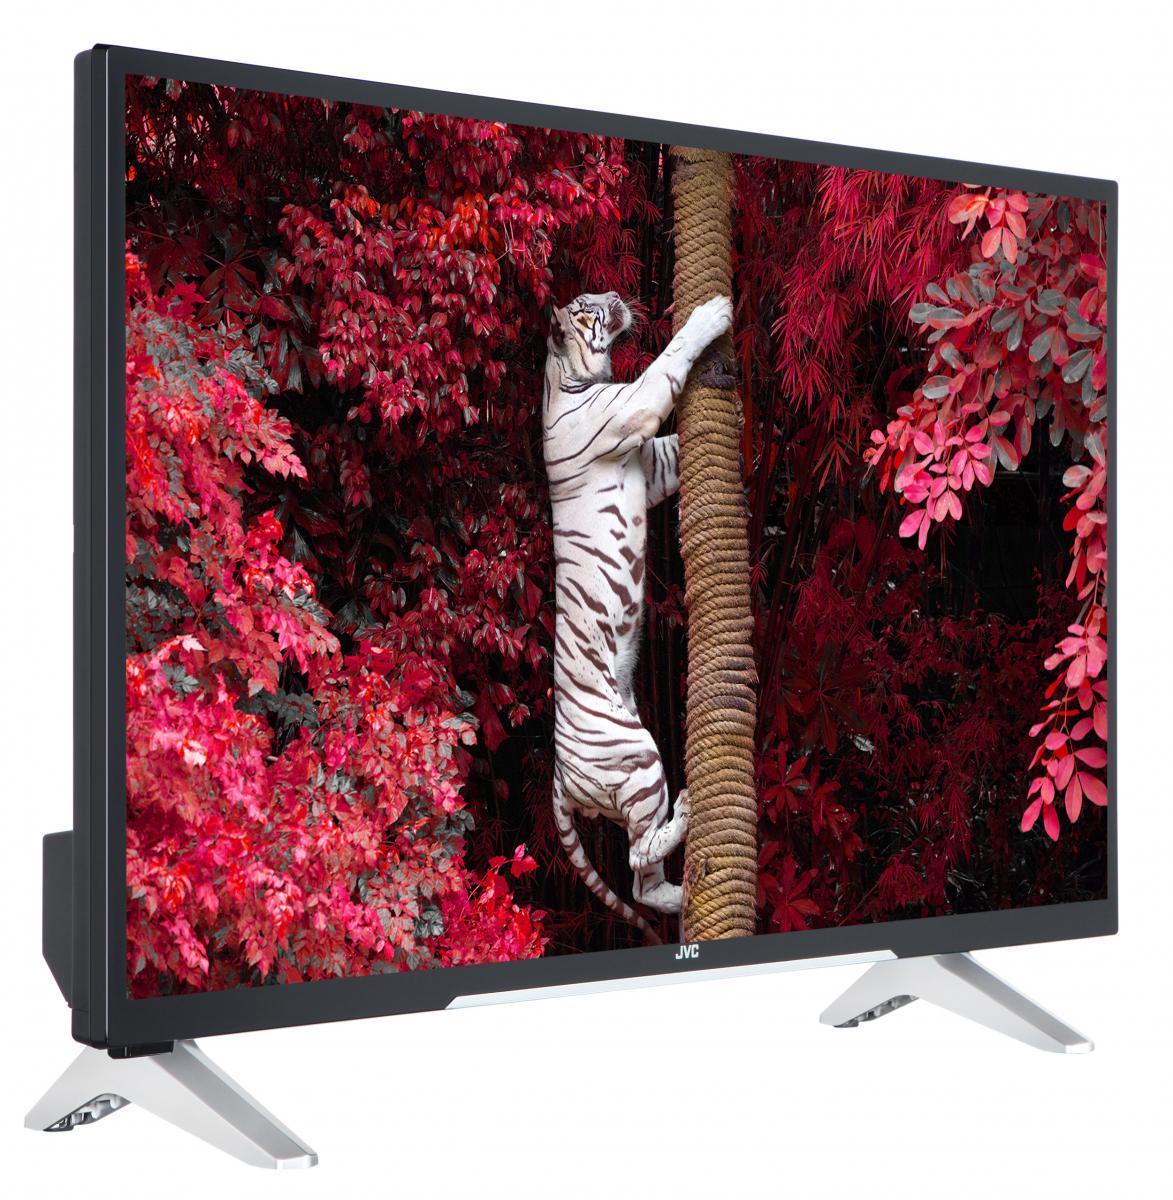 "Bild 2 von JVC LED TV 43"" (110 cm)"